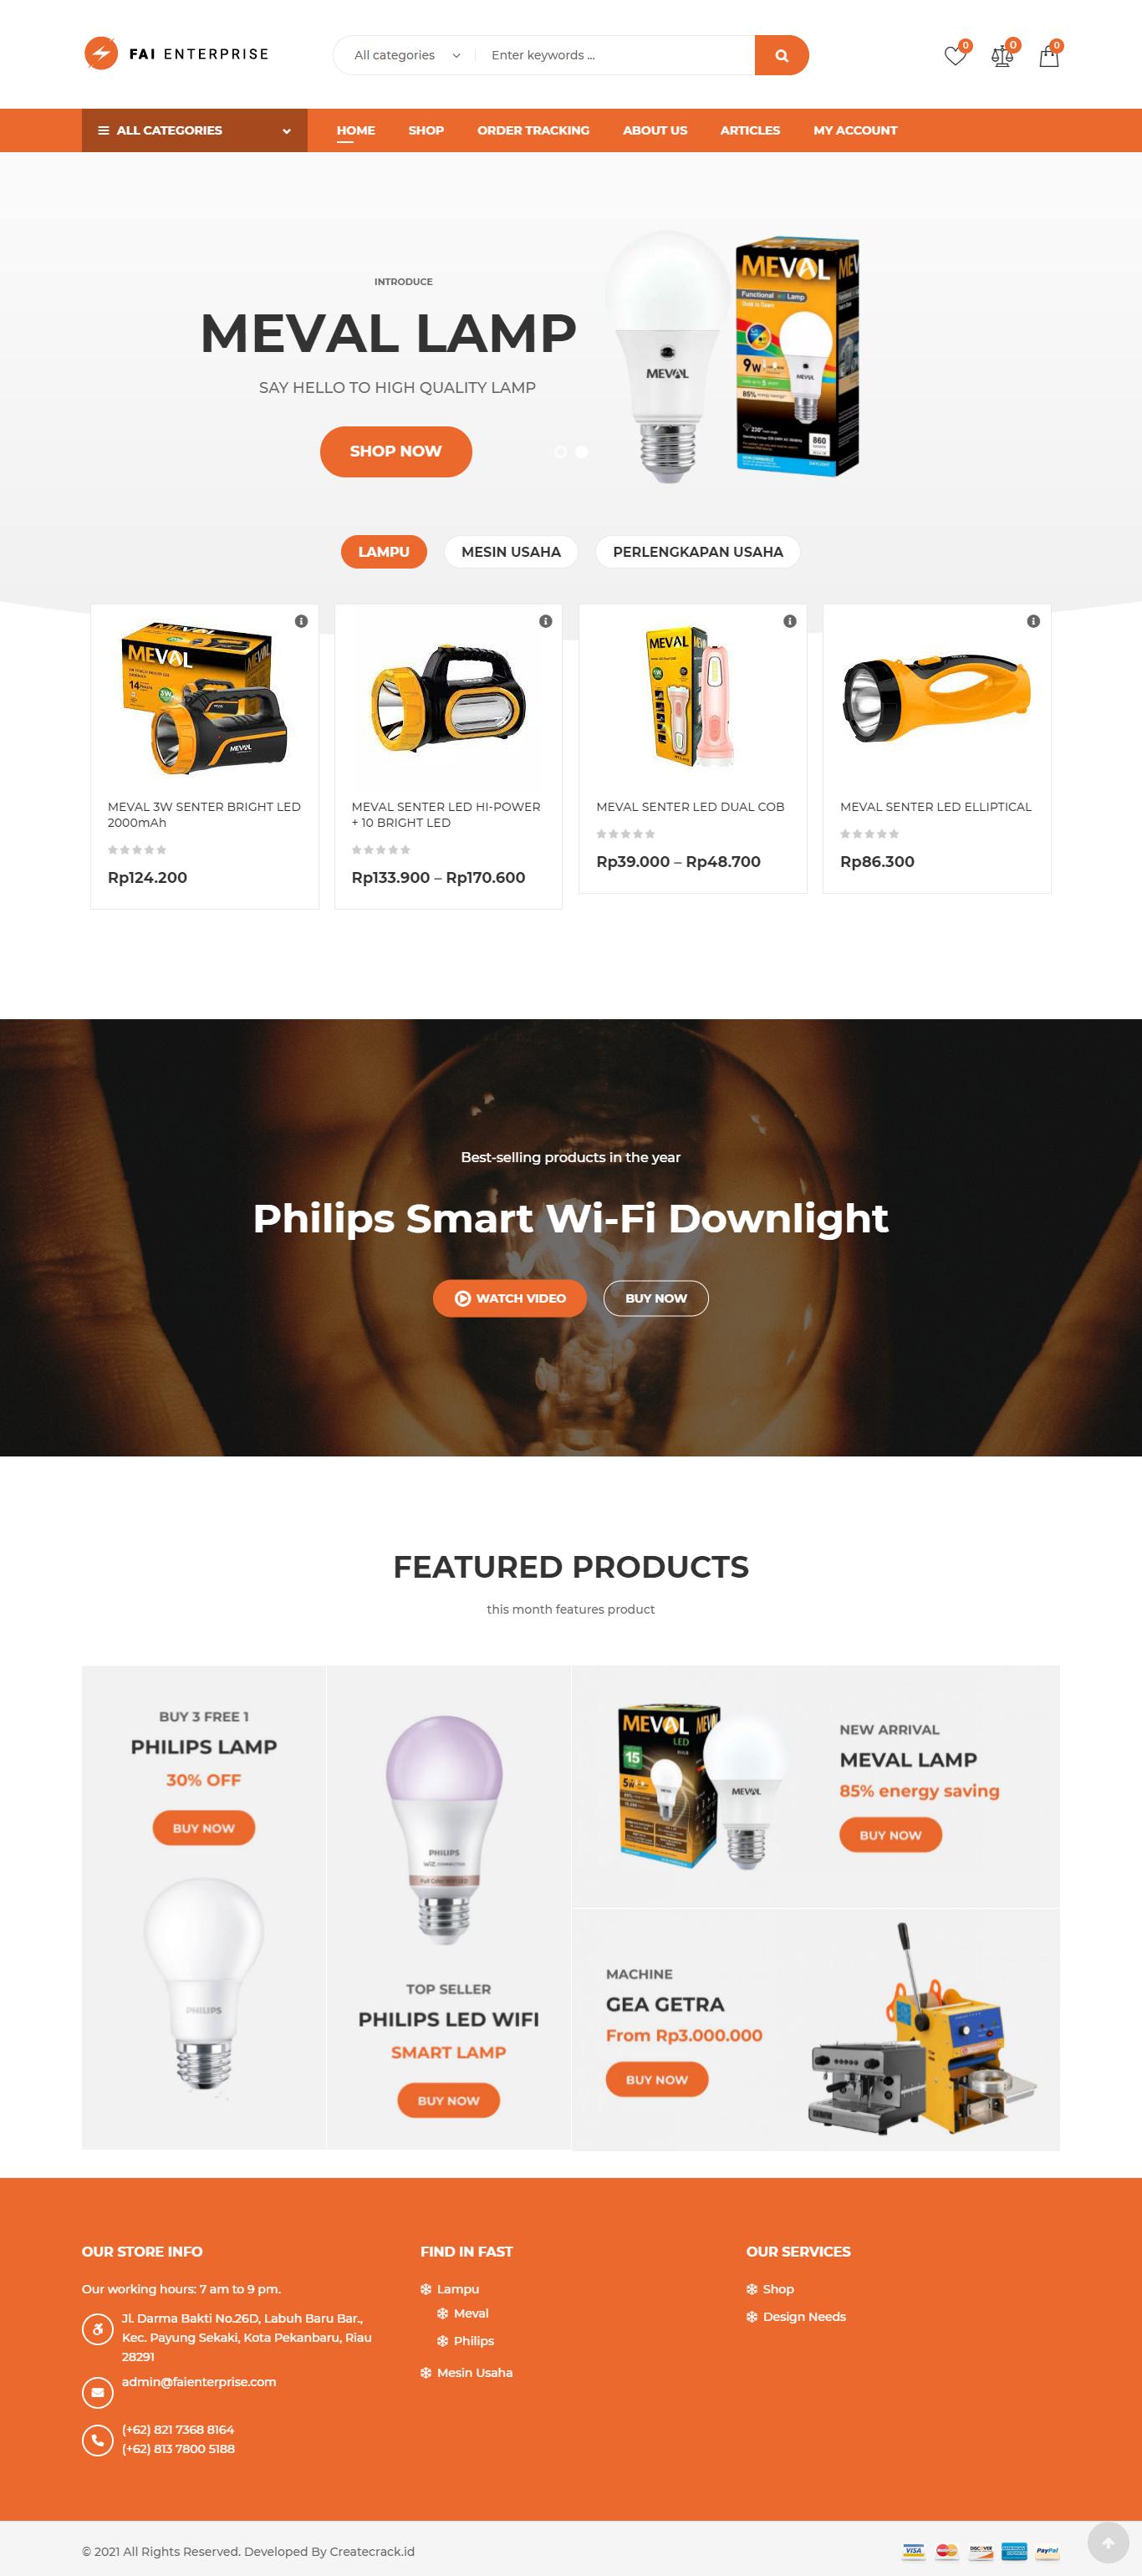 home page fai enterprise